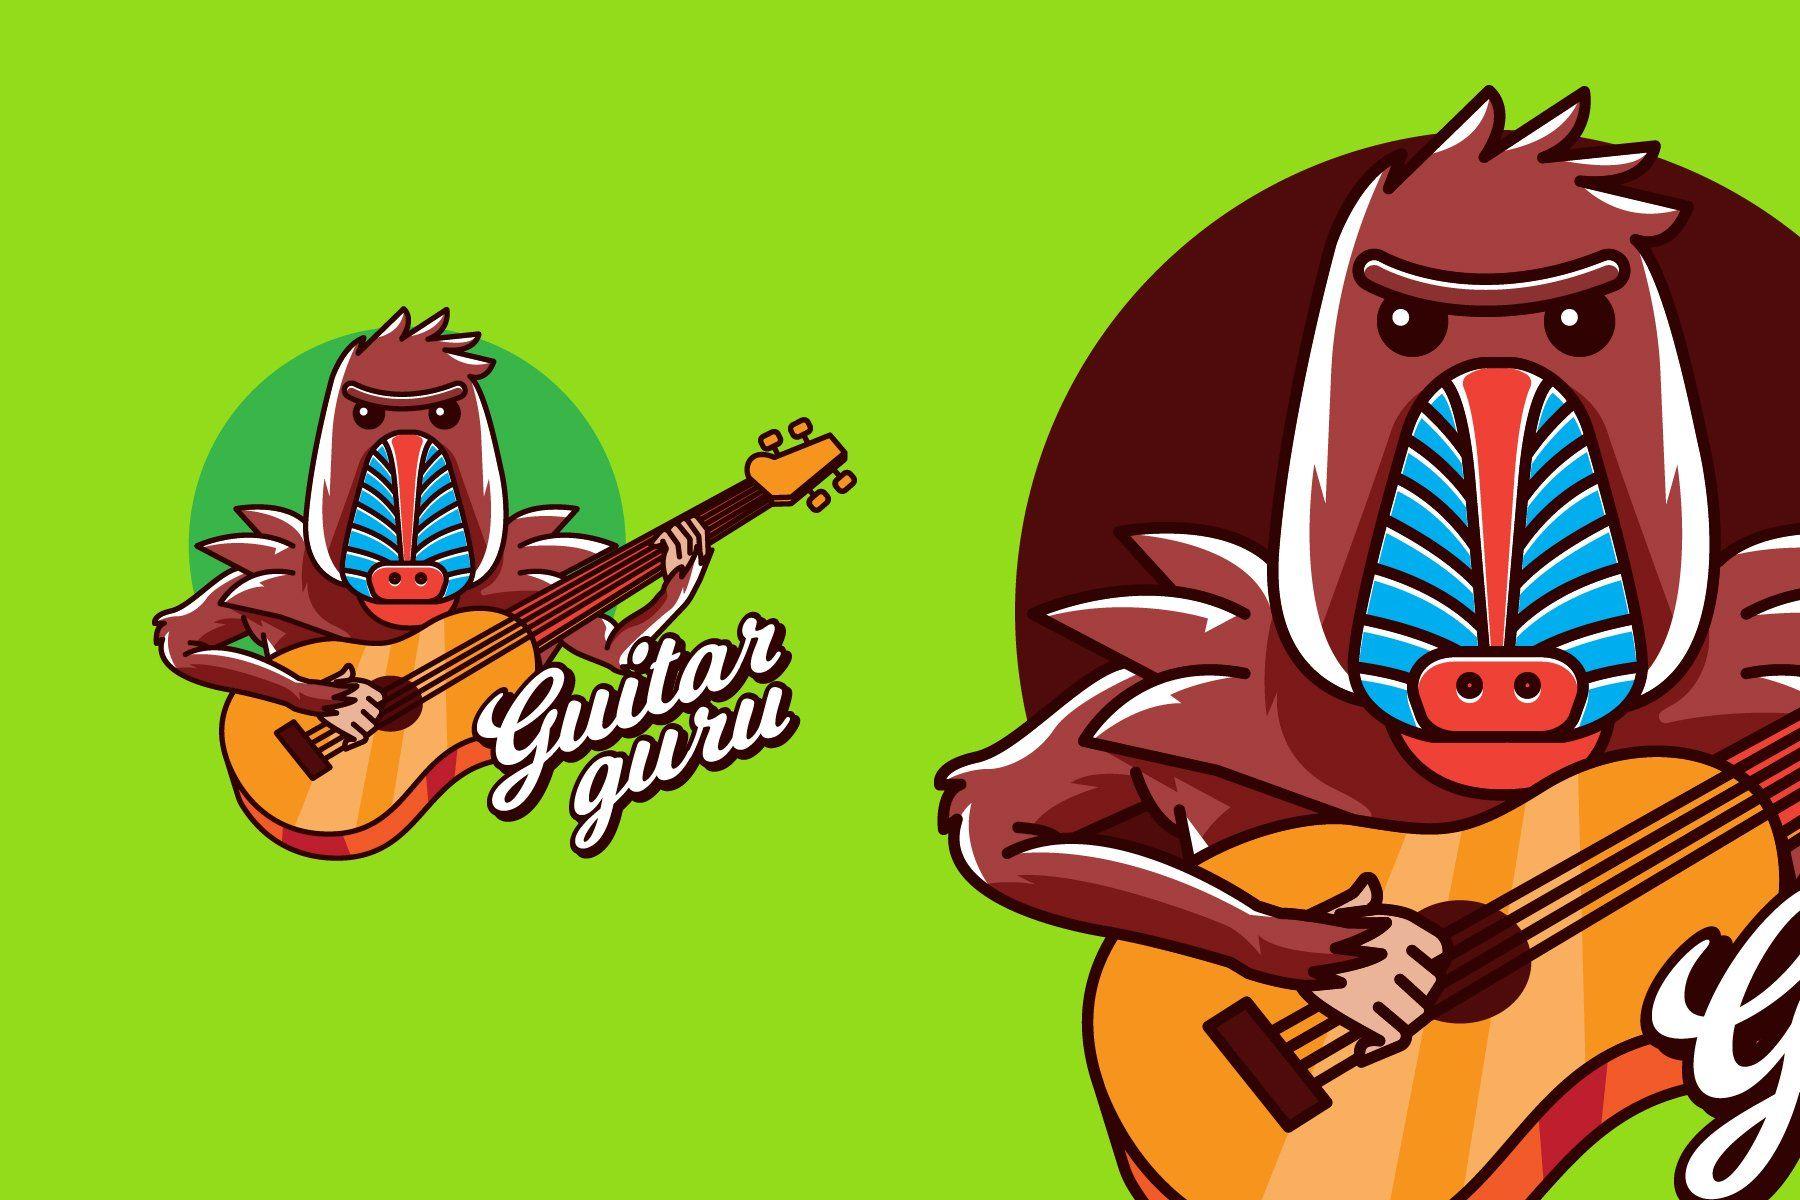 GUITAR GURU Mascot & Esport Logo by AQR Studio on